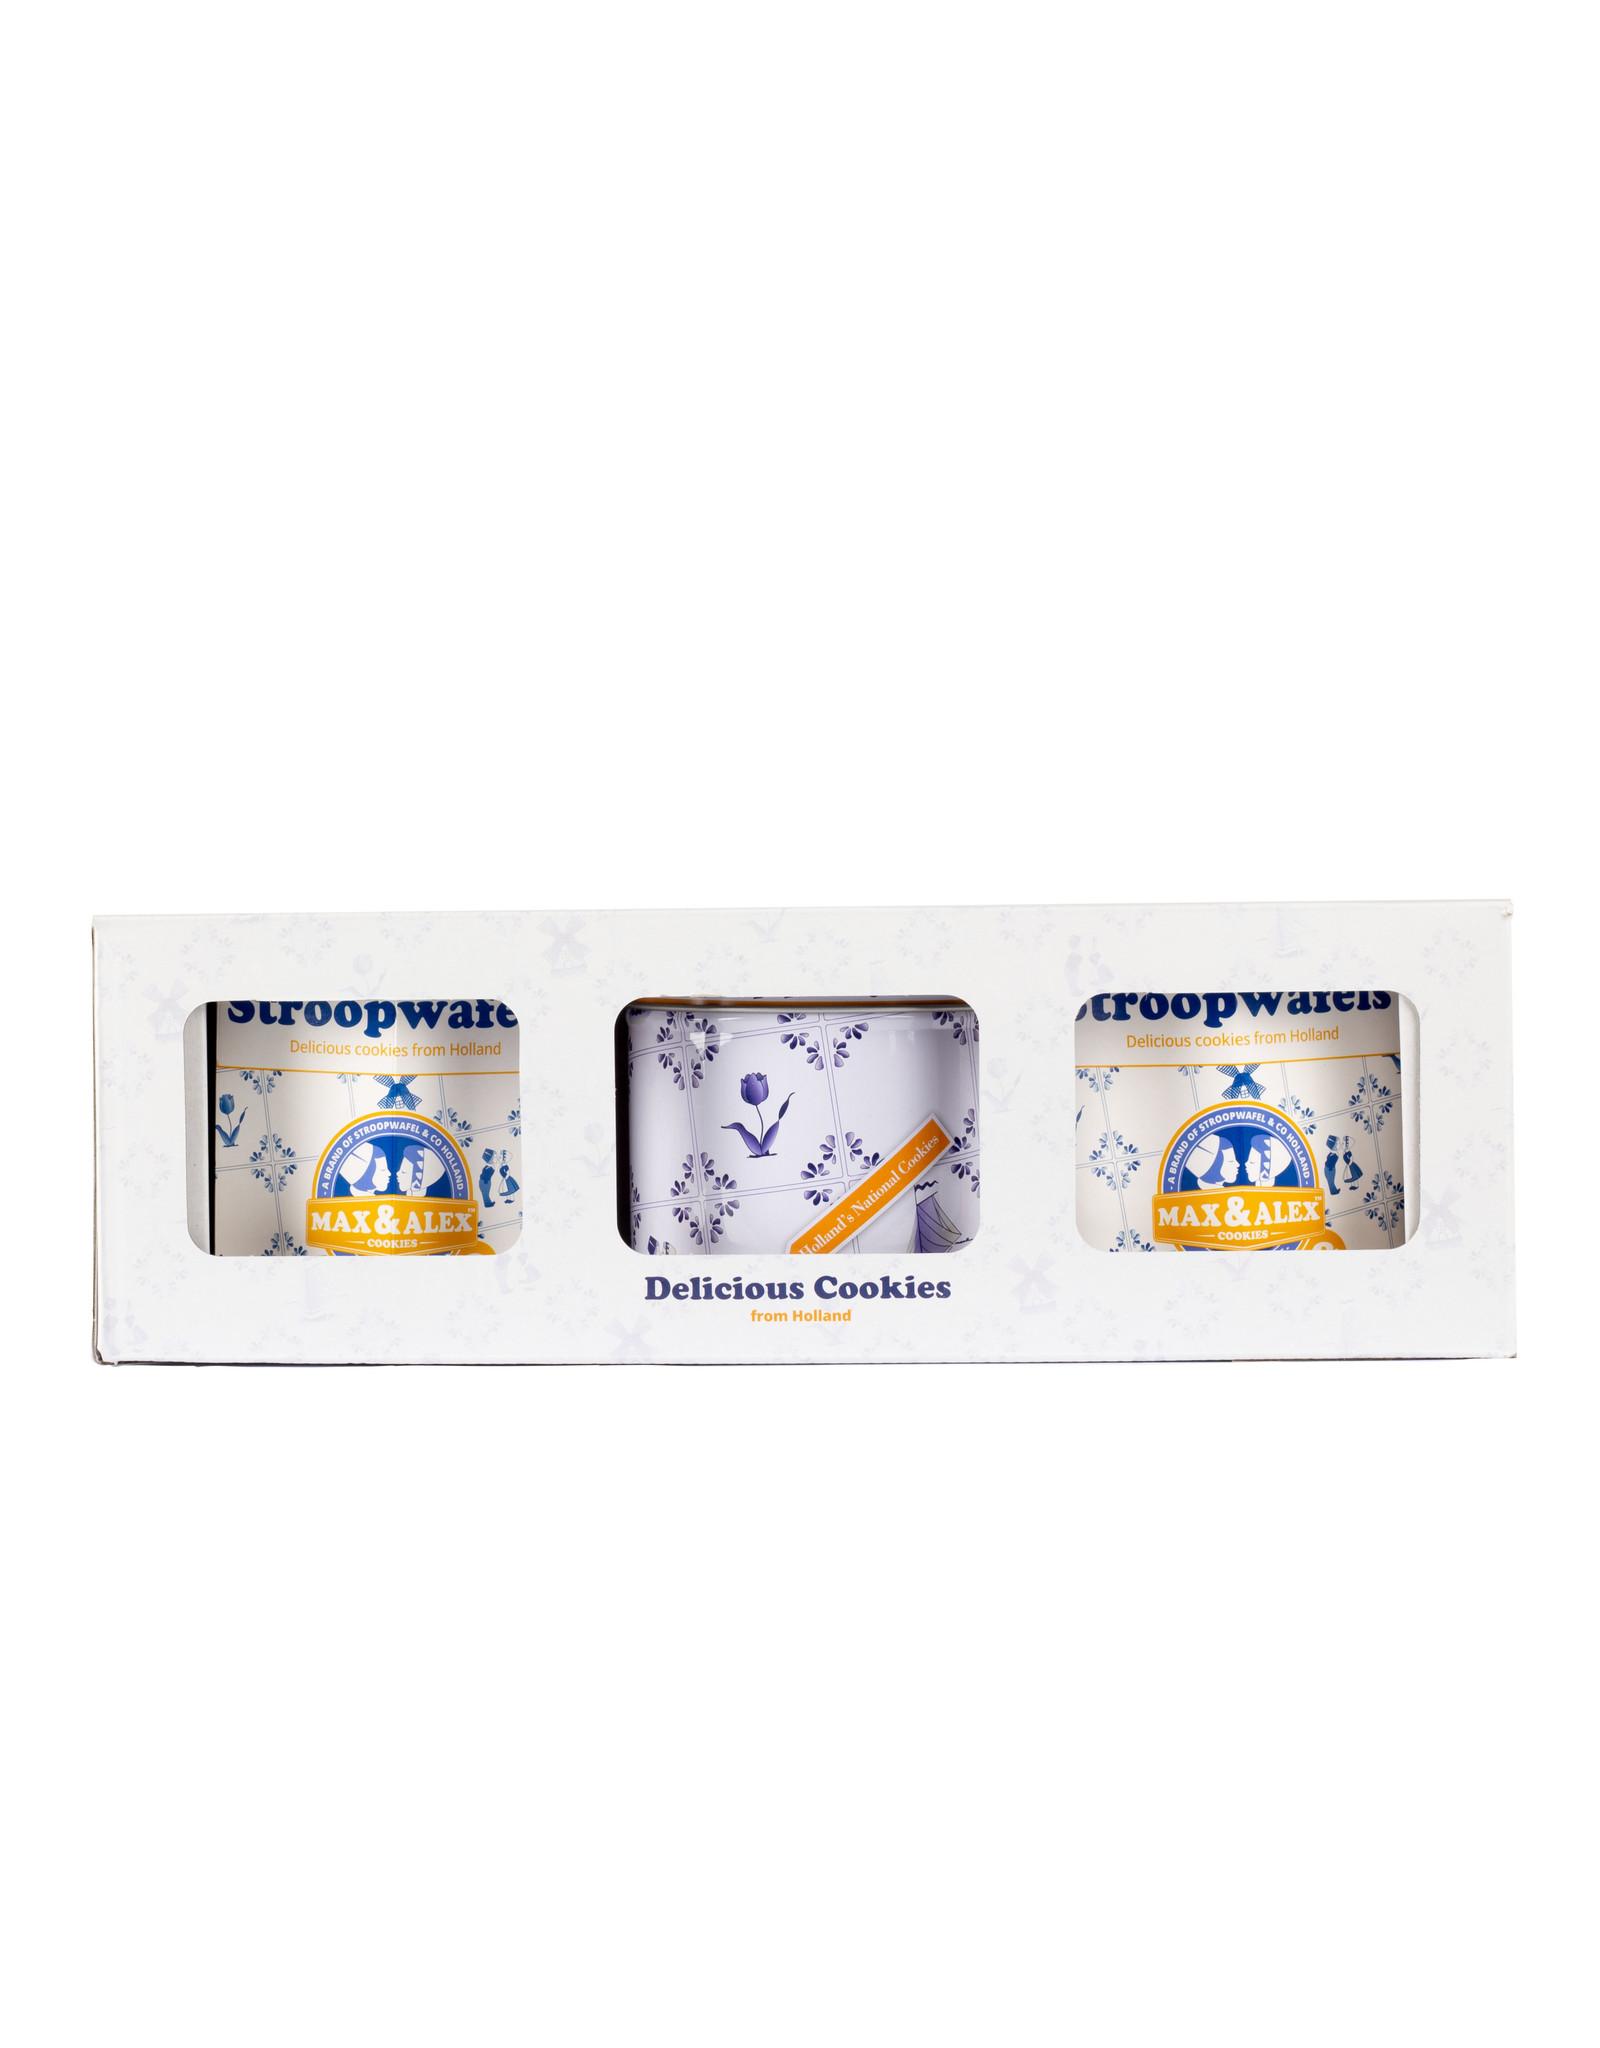 Max & Alex Max & Alex Giftbox Deluxe 2x Hexa + 1x Tin (3x 250 gram) 6x - omdoos single